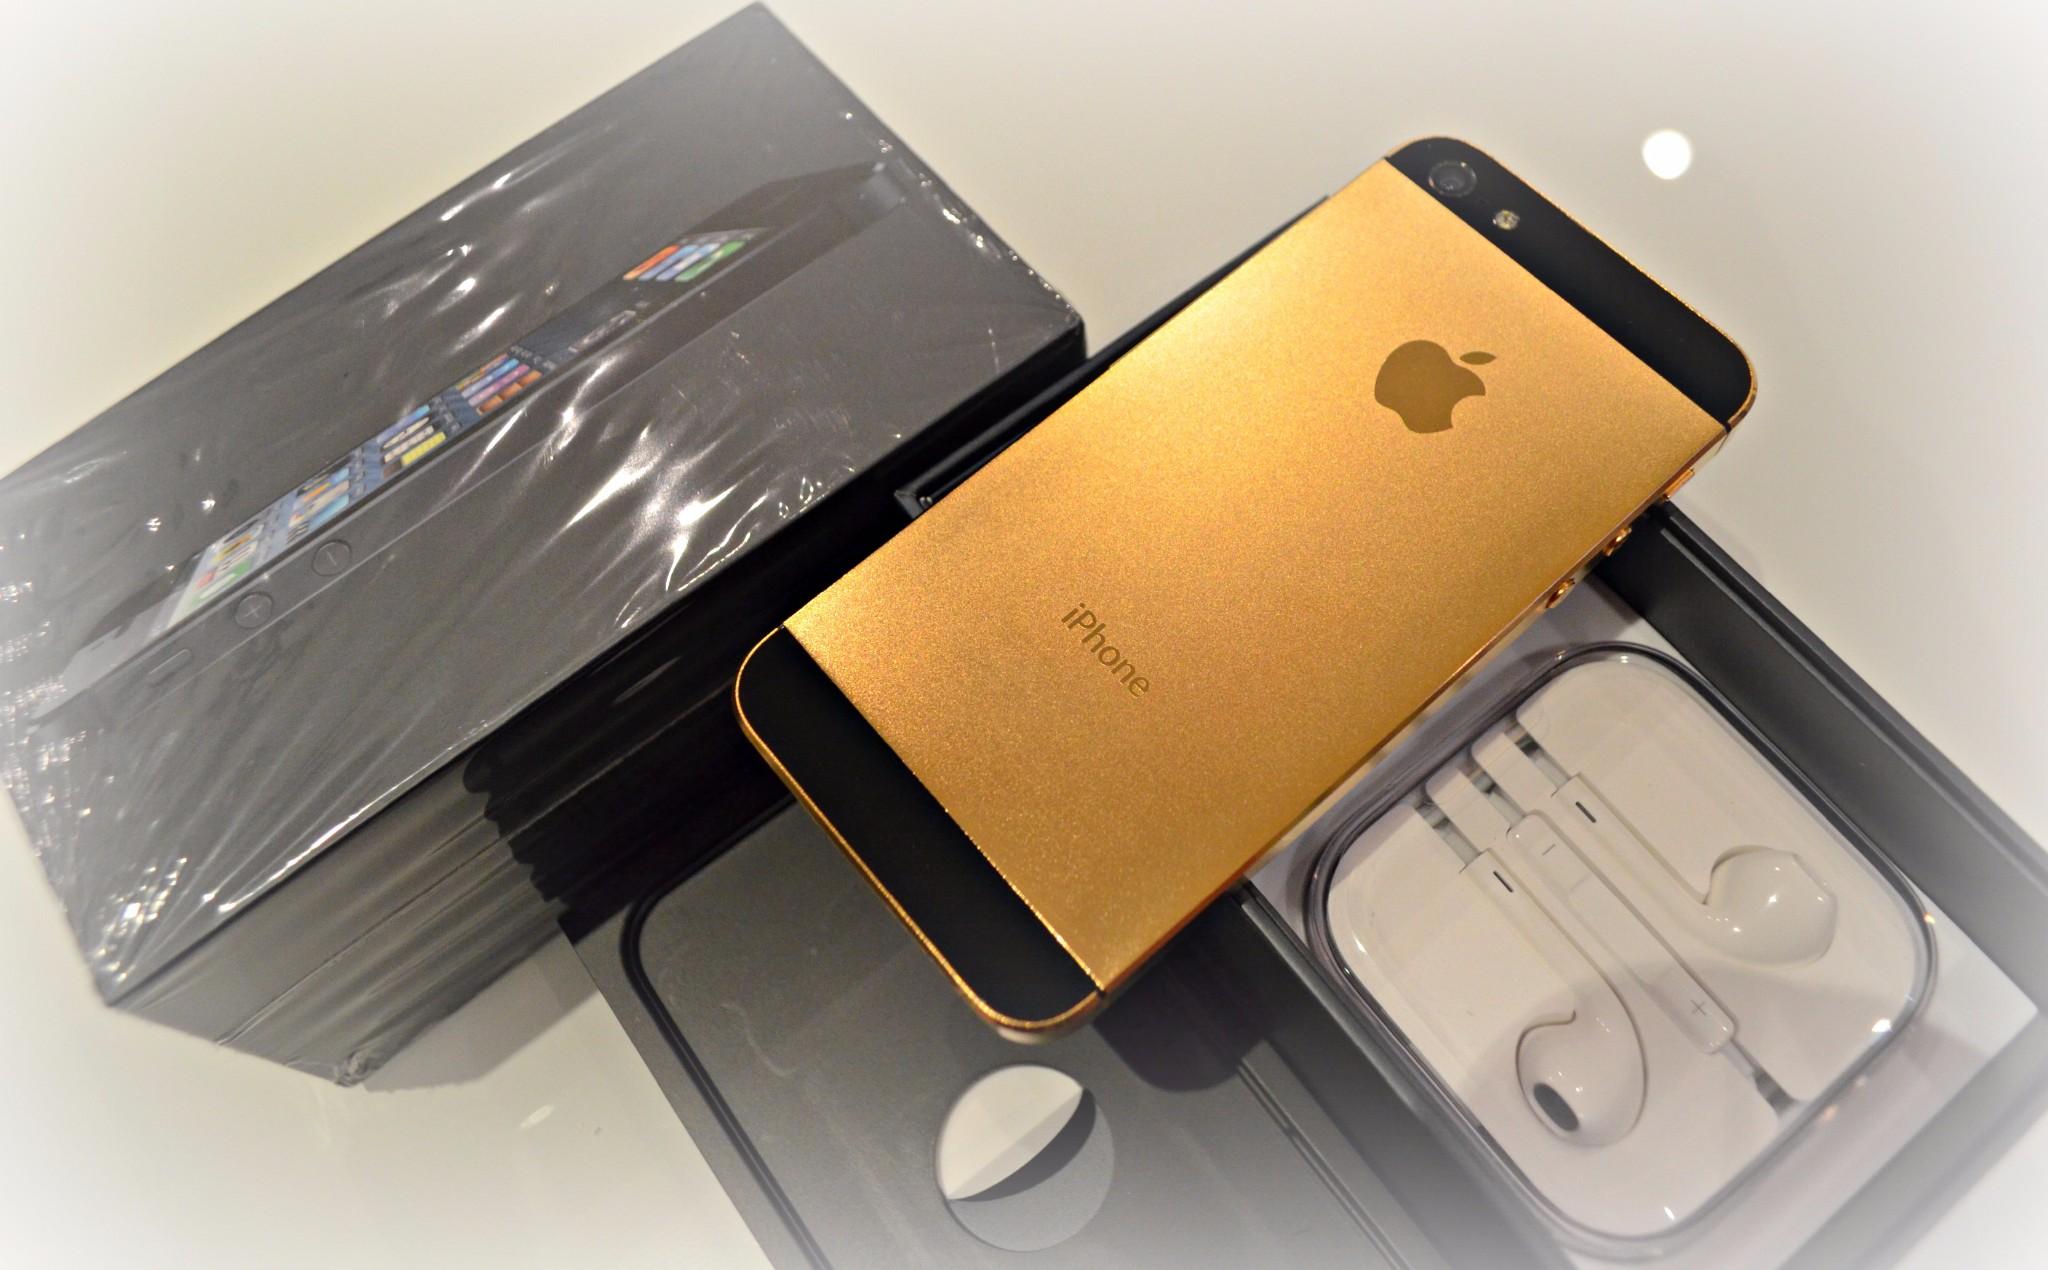 Harga Iphone 5 Black Gold 16 Gb Garansi 1 Tahun Jual Apple 16gb Spesial Edition Maya Grosir Gadget